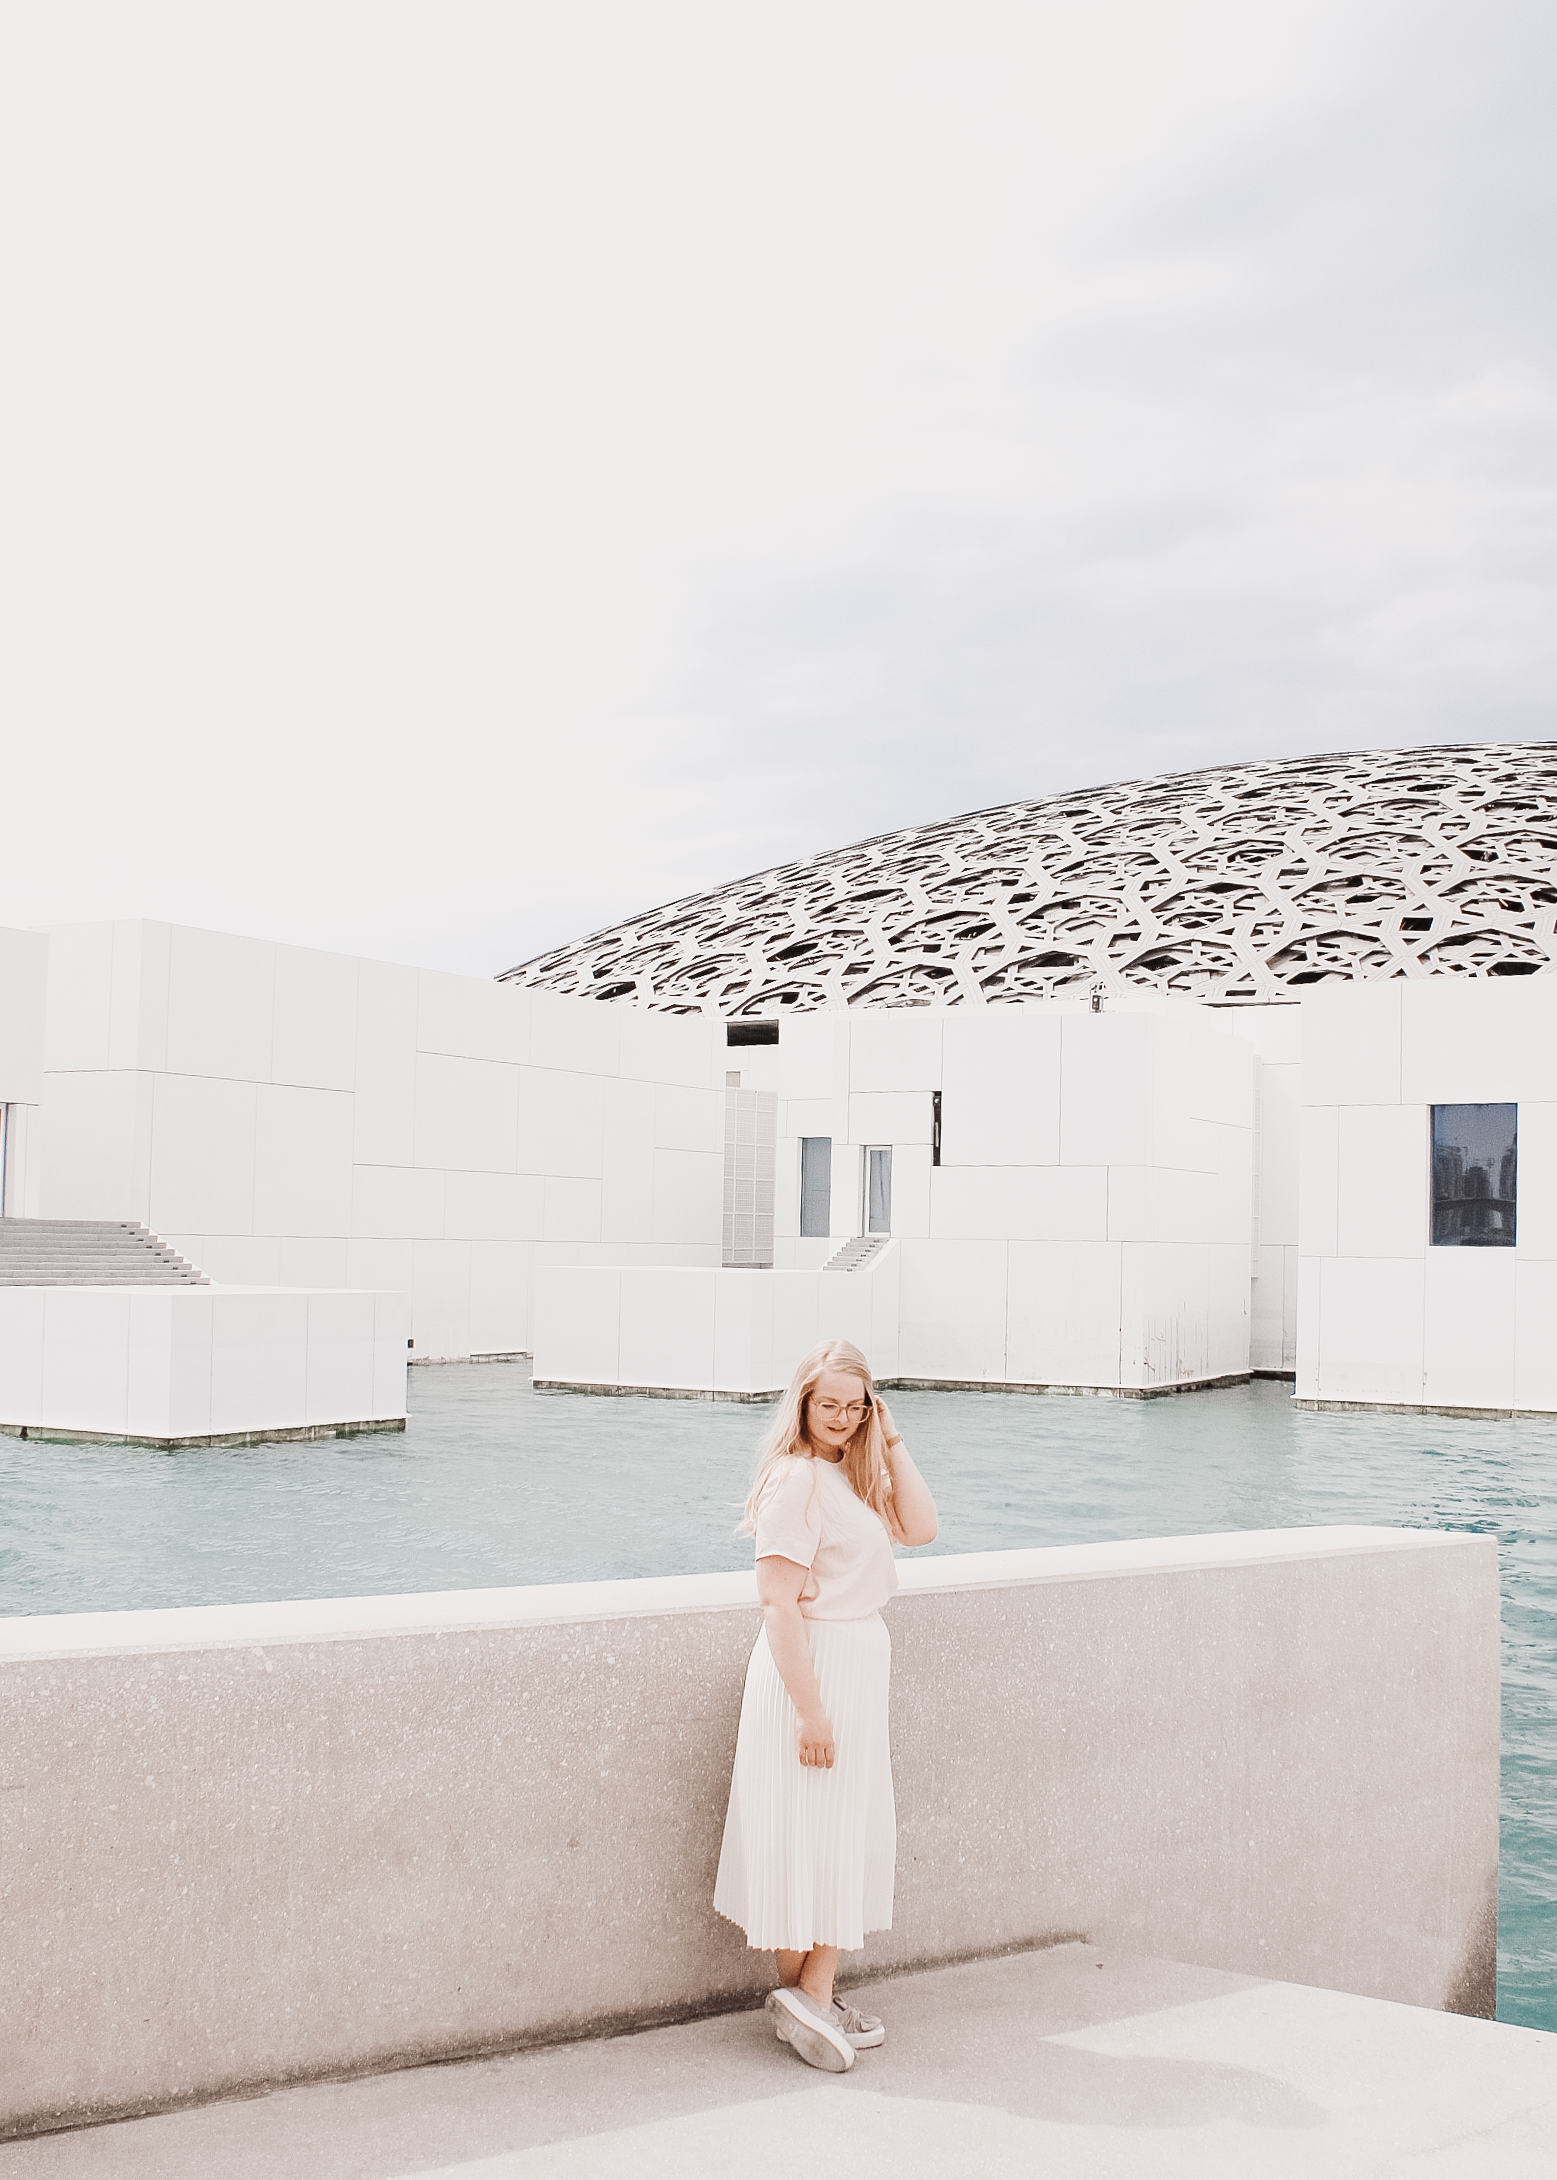 Abu Dhabi Louvre | Sandramarias.com